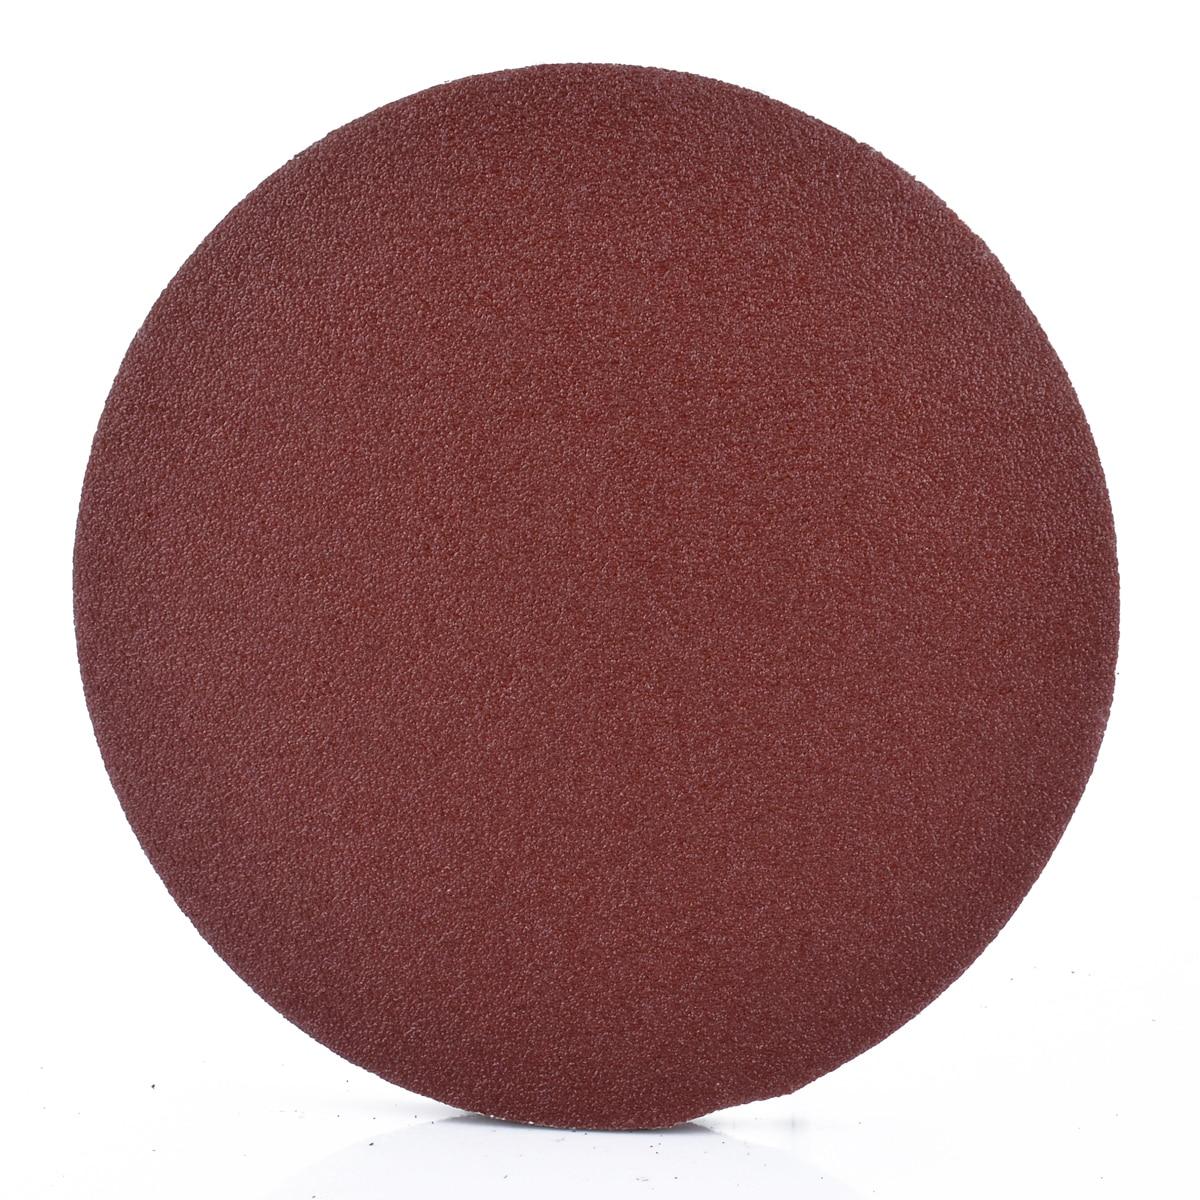 30Pcs 6 Inch Self Adhesive Sanding Disk 80/180/320 Grit Sanding Disc Stick On Sandpaper Peel For Polishing Abrasive Rotary Tools